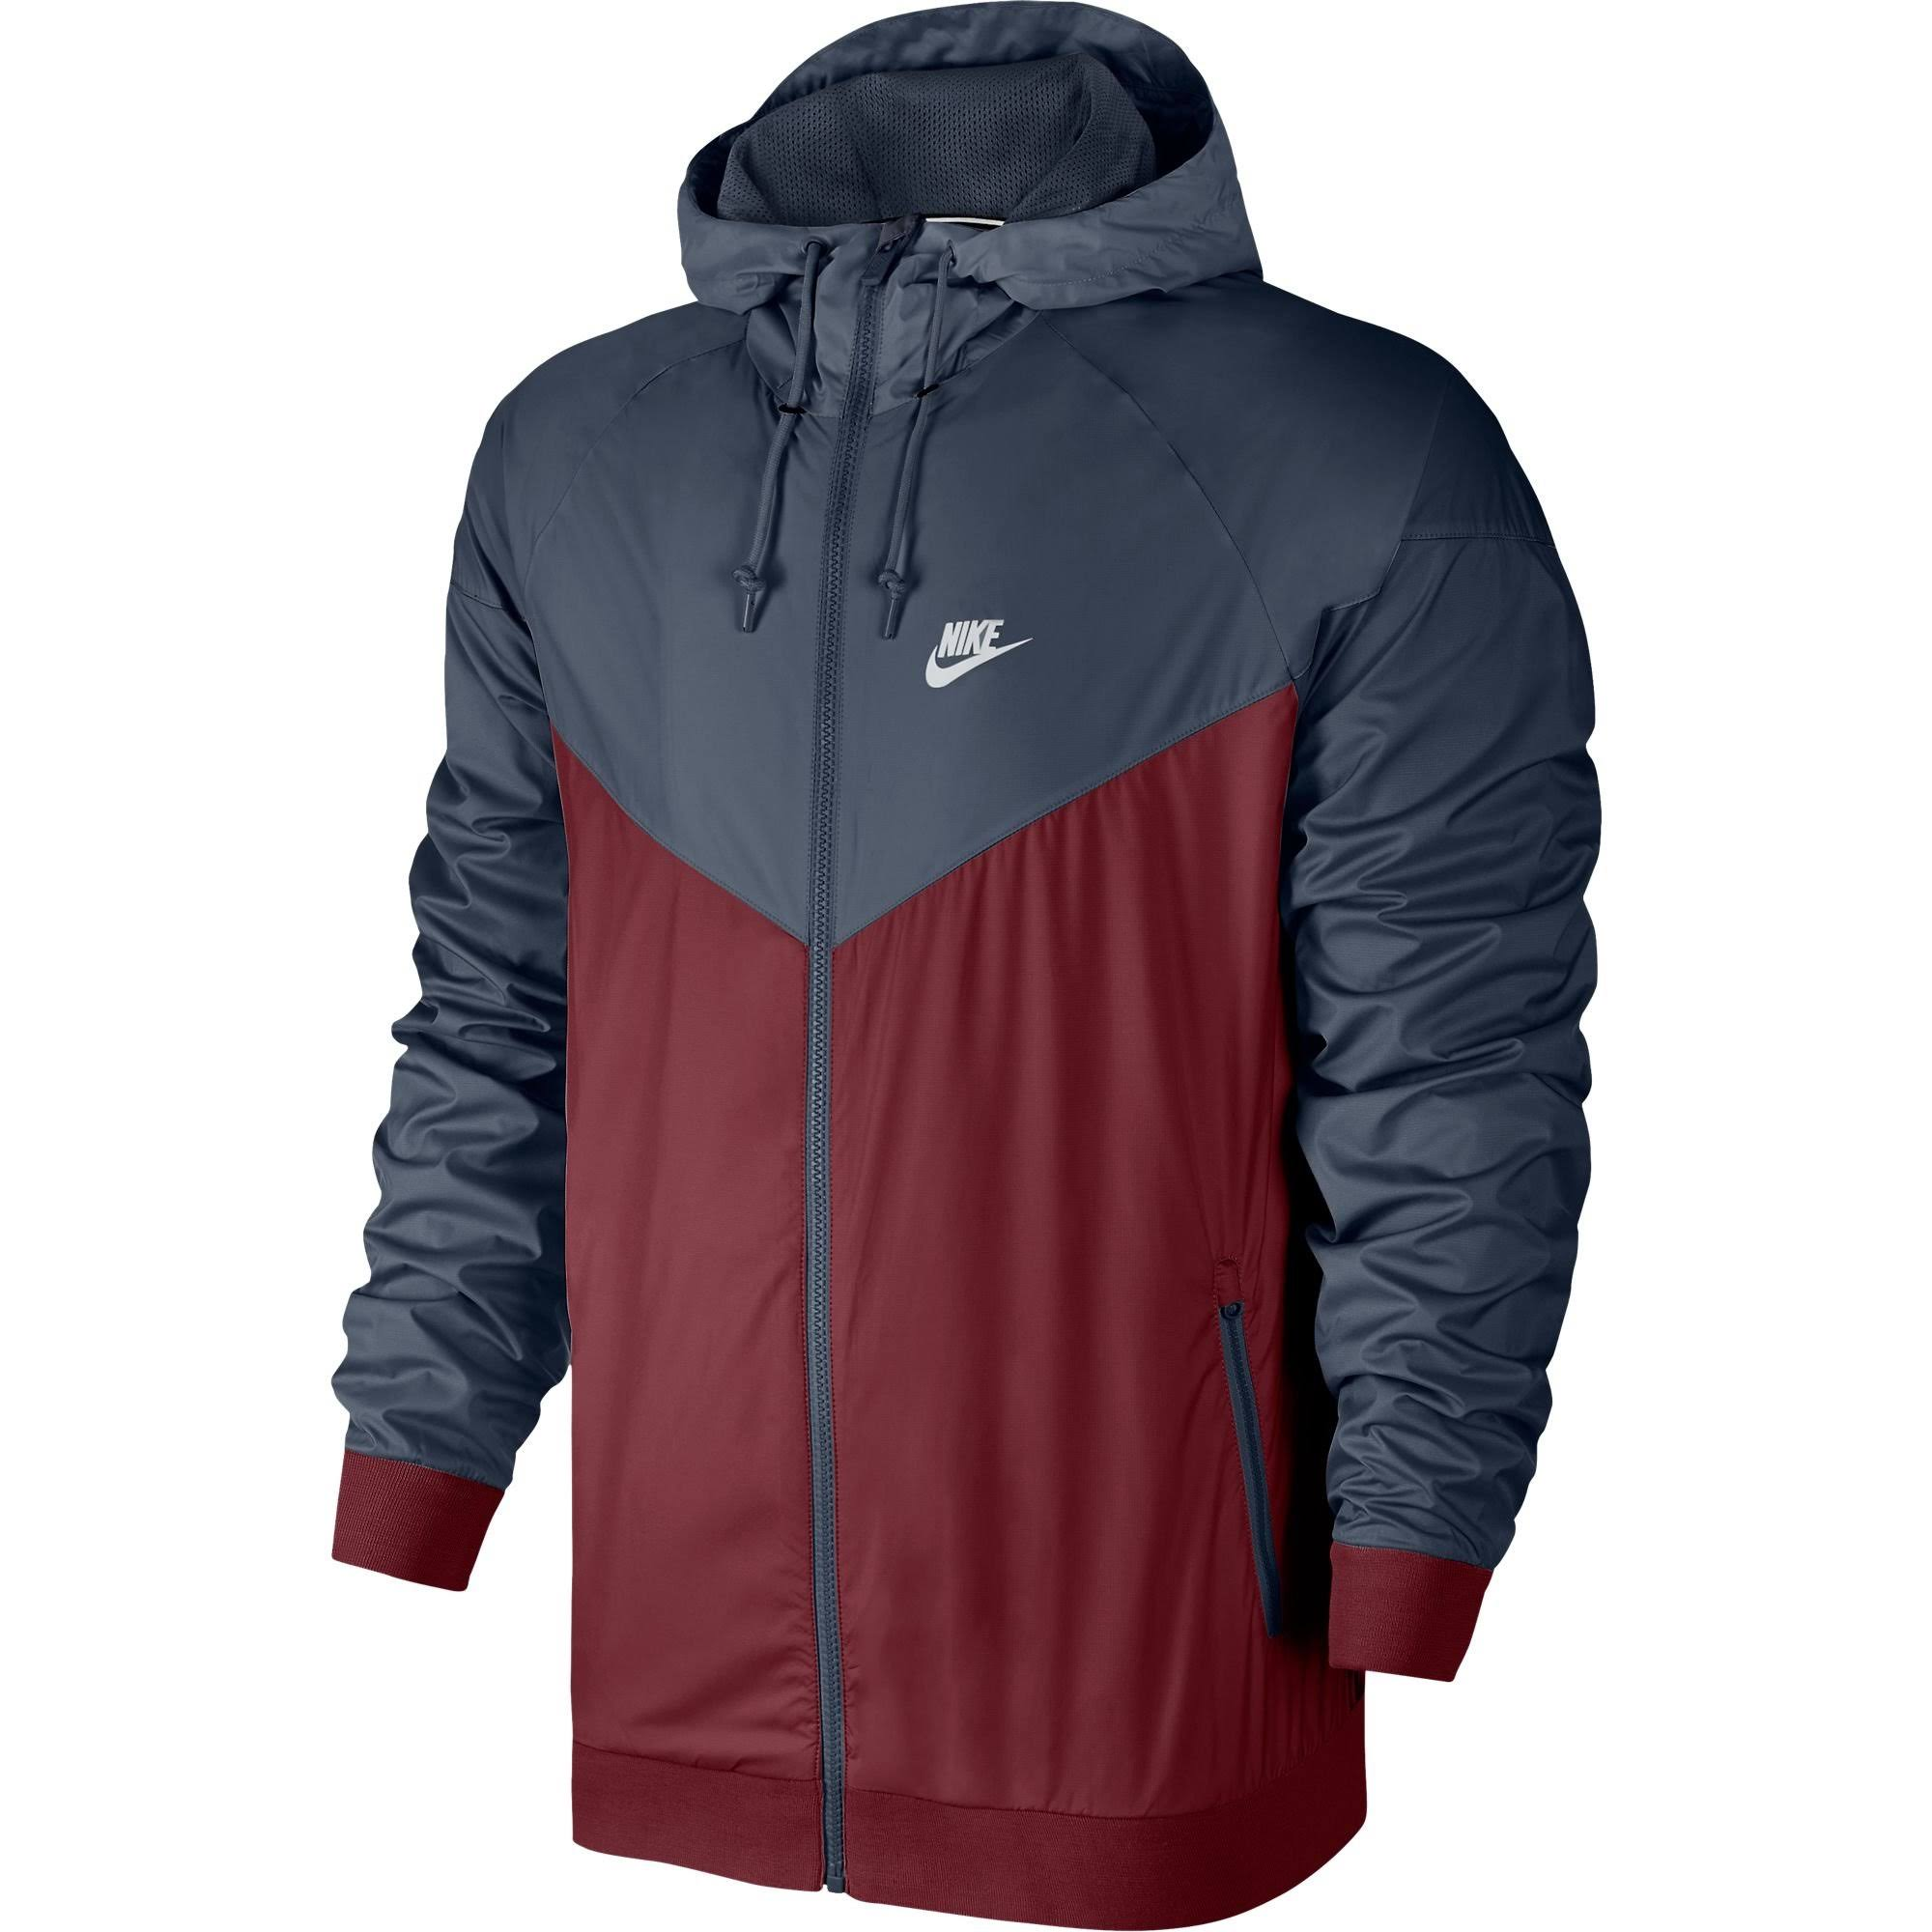 Xl Windrunner Talla Chaqueta Nike 727324679 Hombre ABqw1z